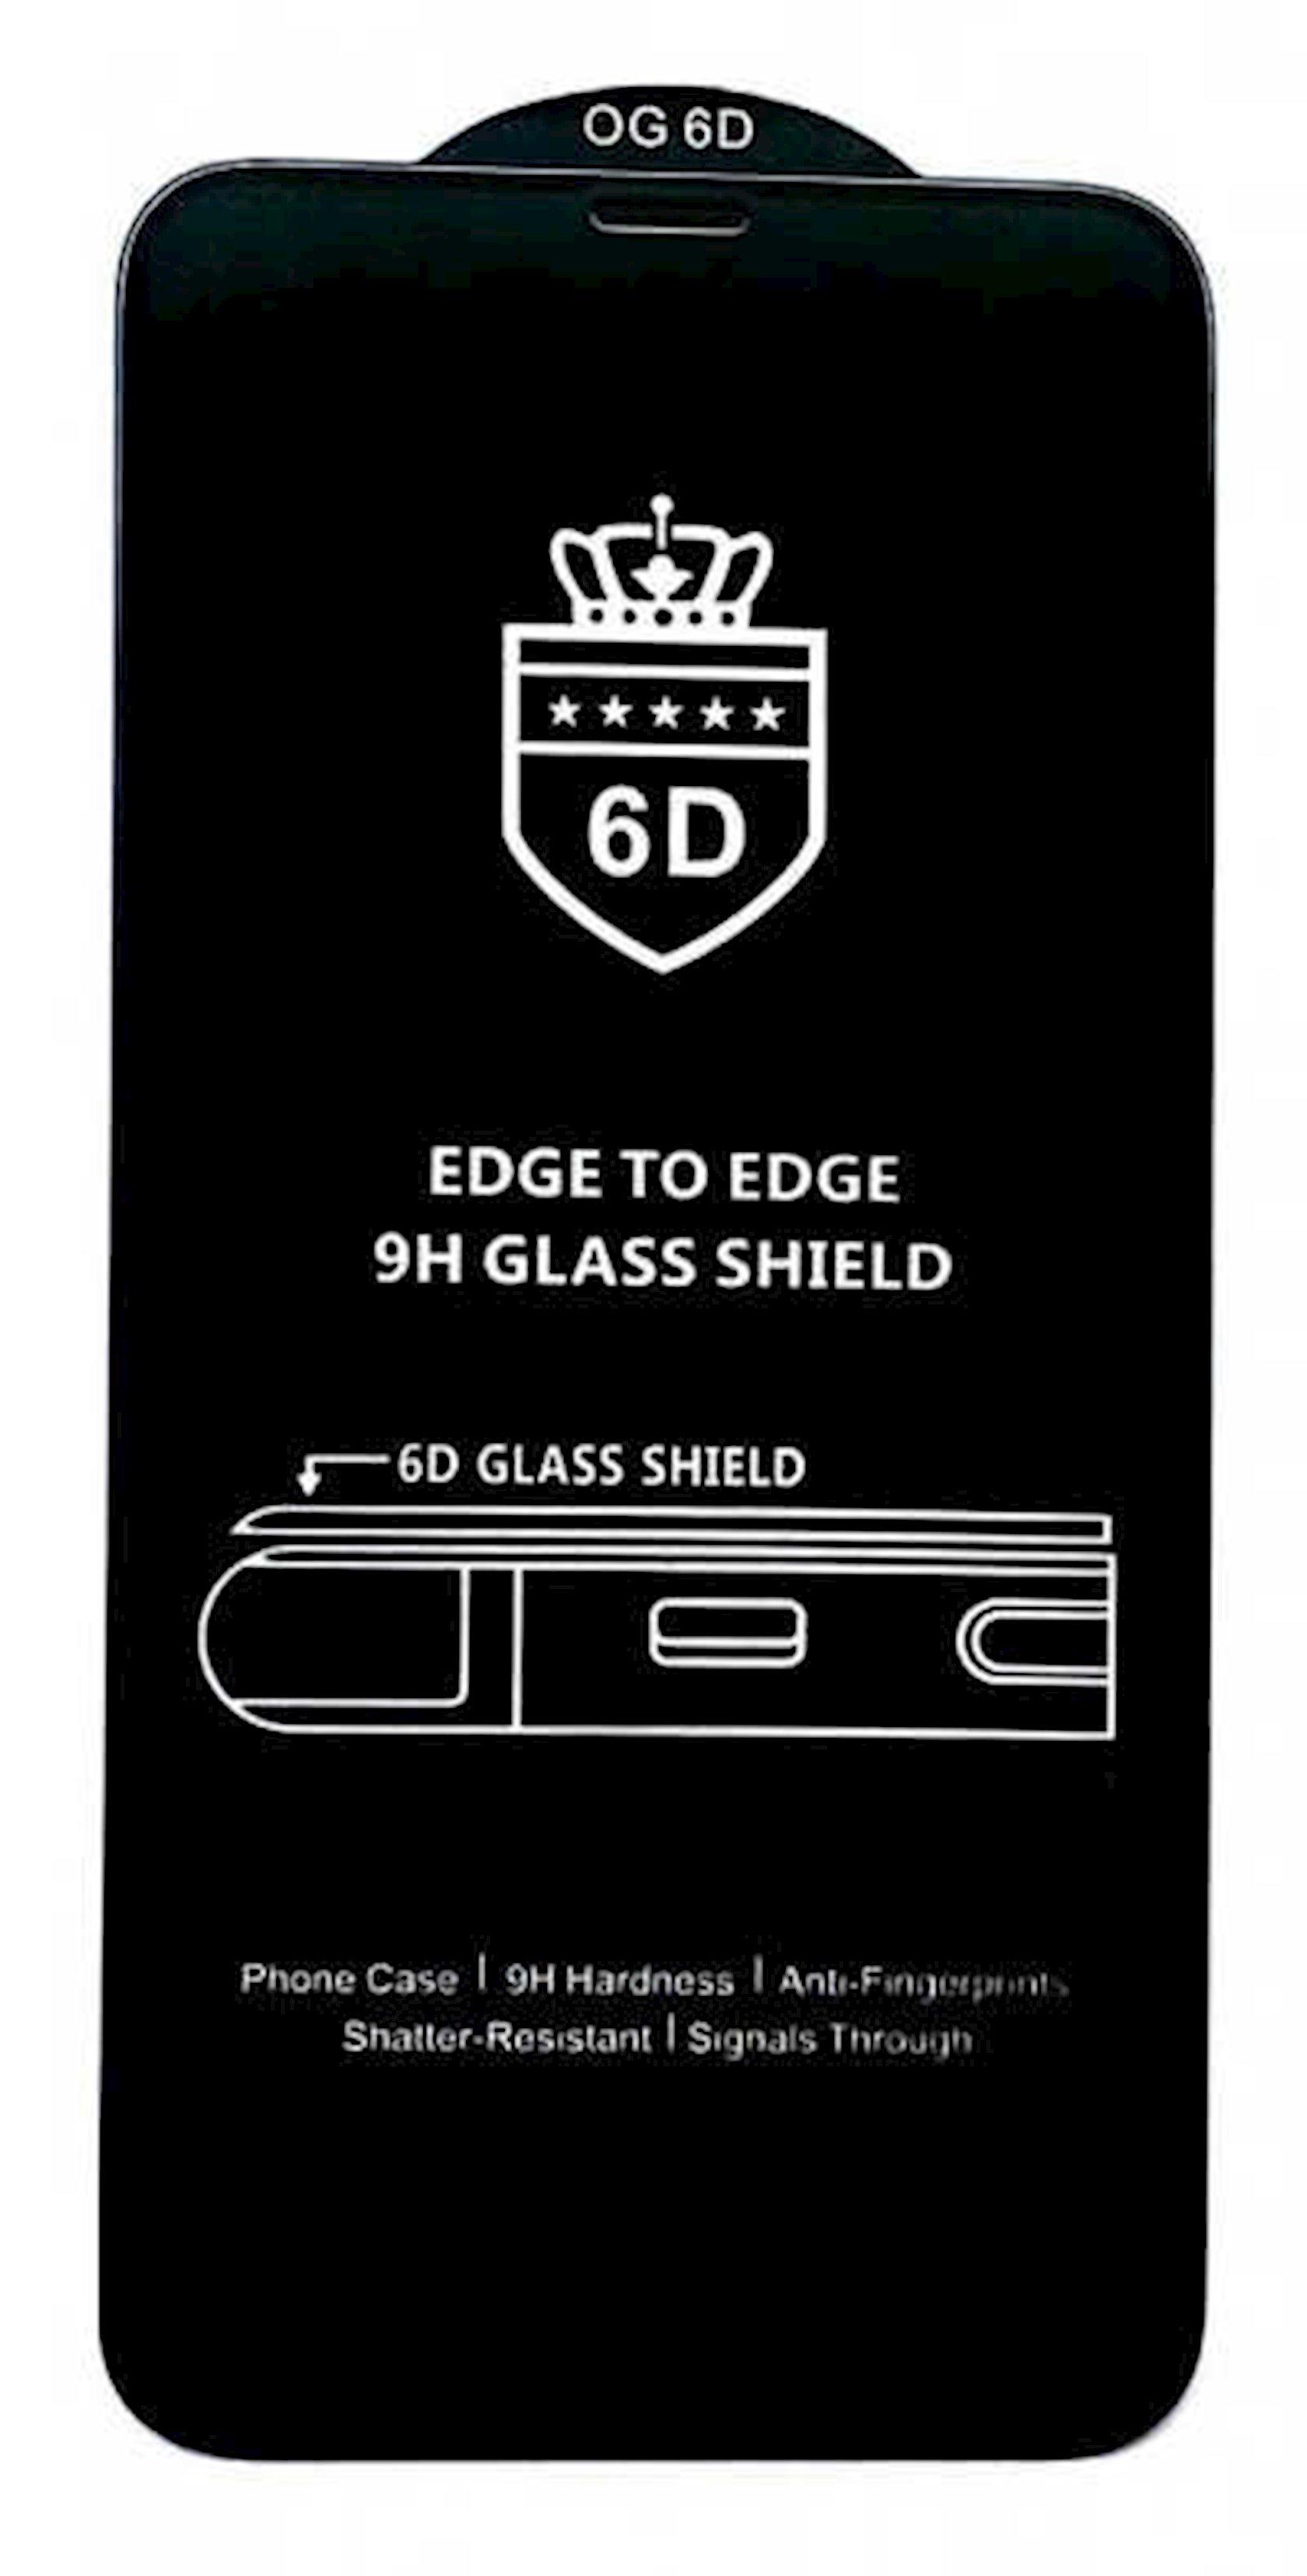 Qoruyucu şüşə OG 6D Premium Samsung A32/A31/A20/A30/A30s/A50/A50s üçün Black